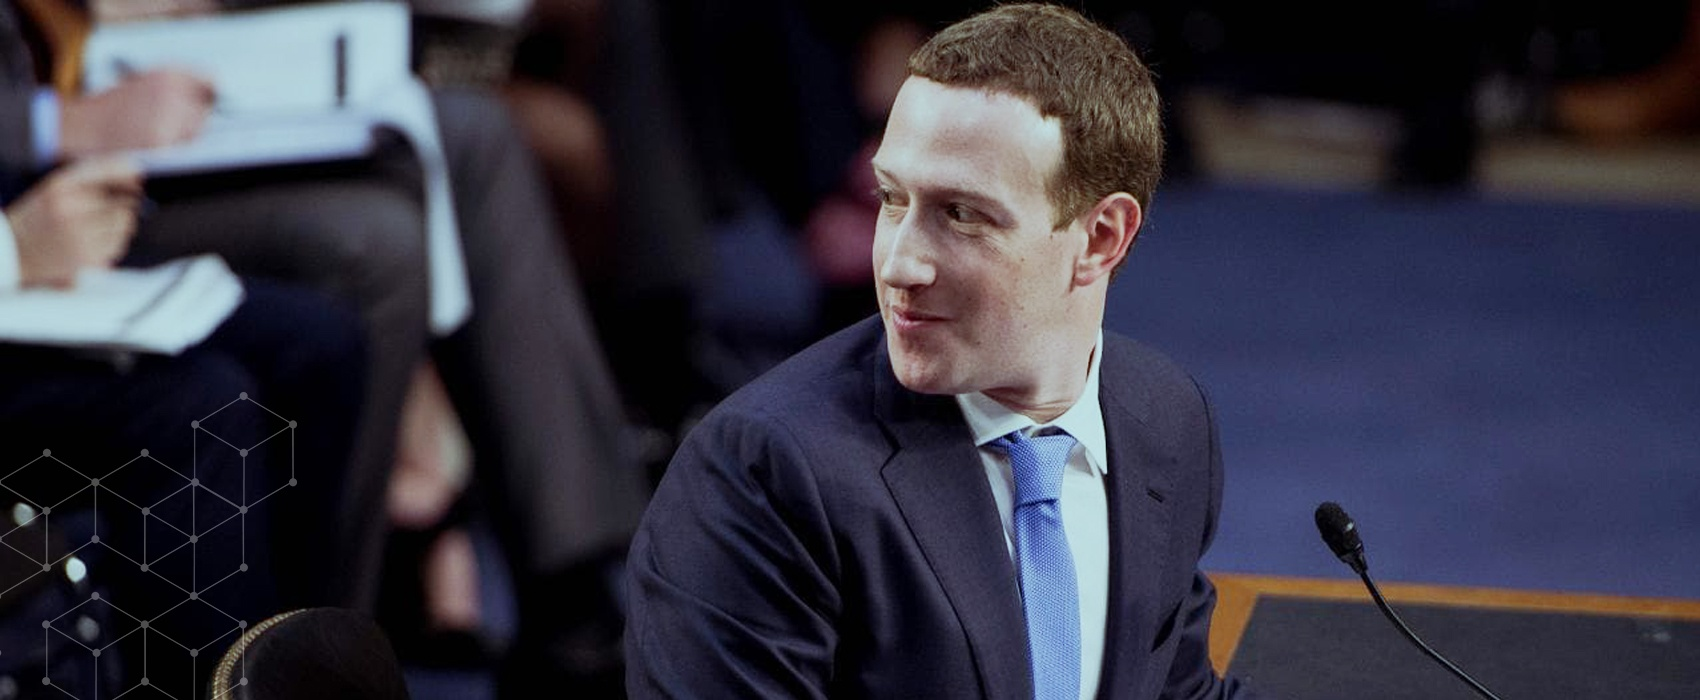 Mark Zuckerberg at US Congress hearing